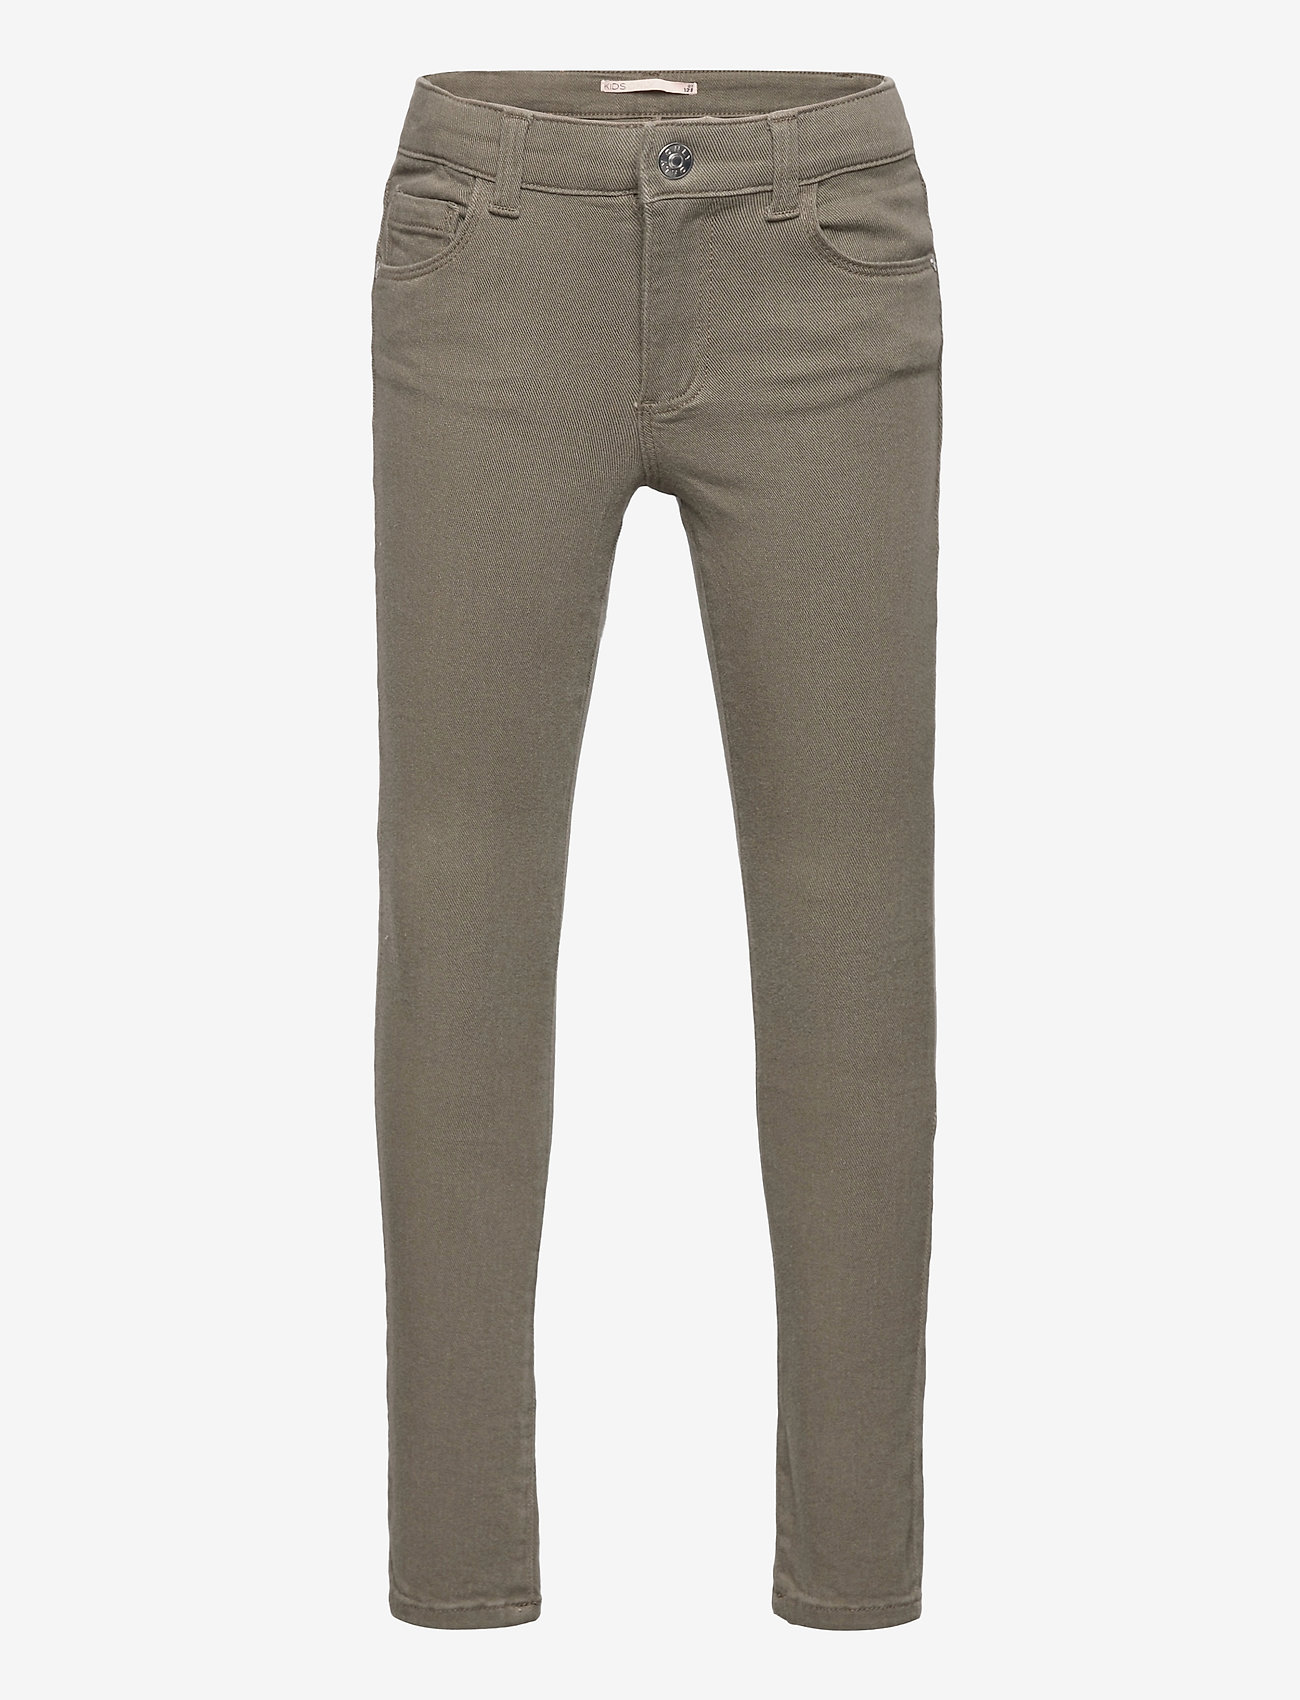 Kids Only - KONWONDER LIFE COLORED DNM JEANS - jeans - kalamata - 0